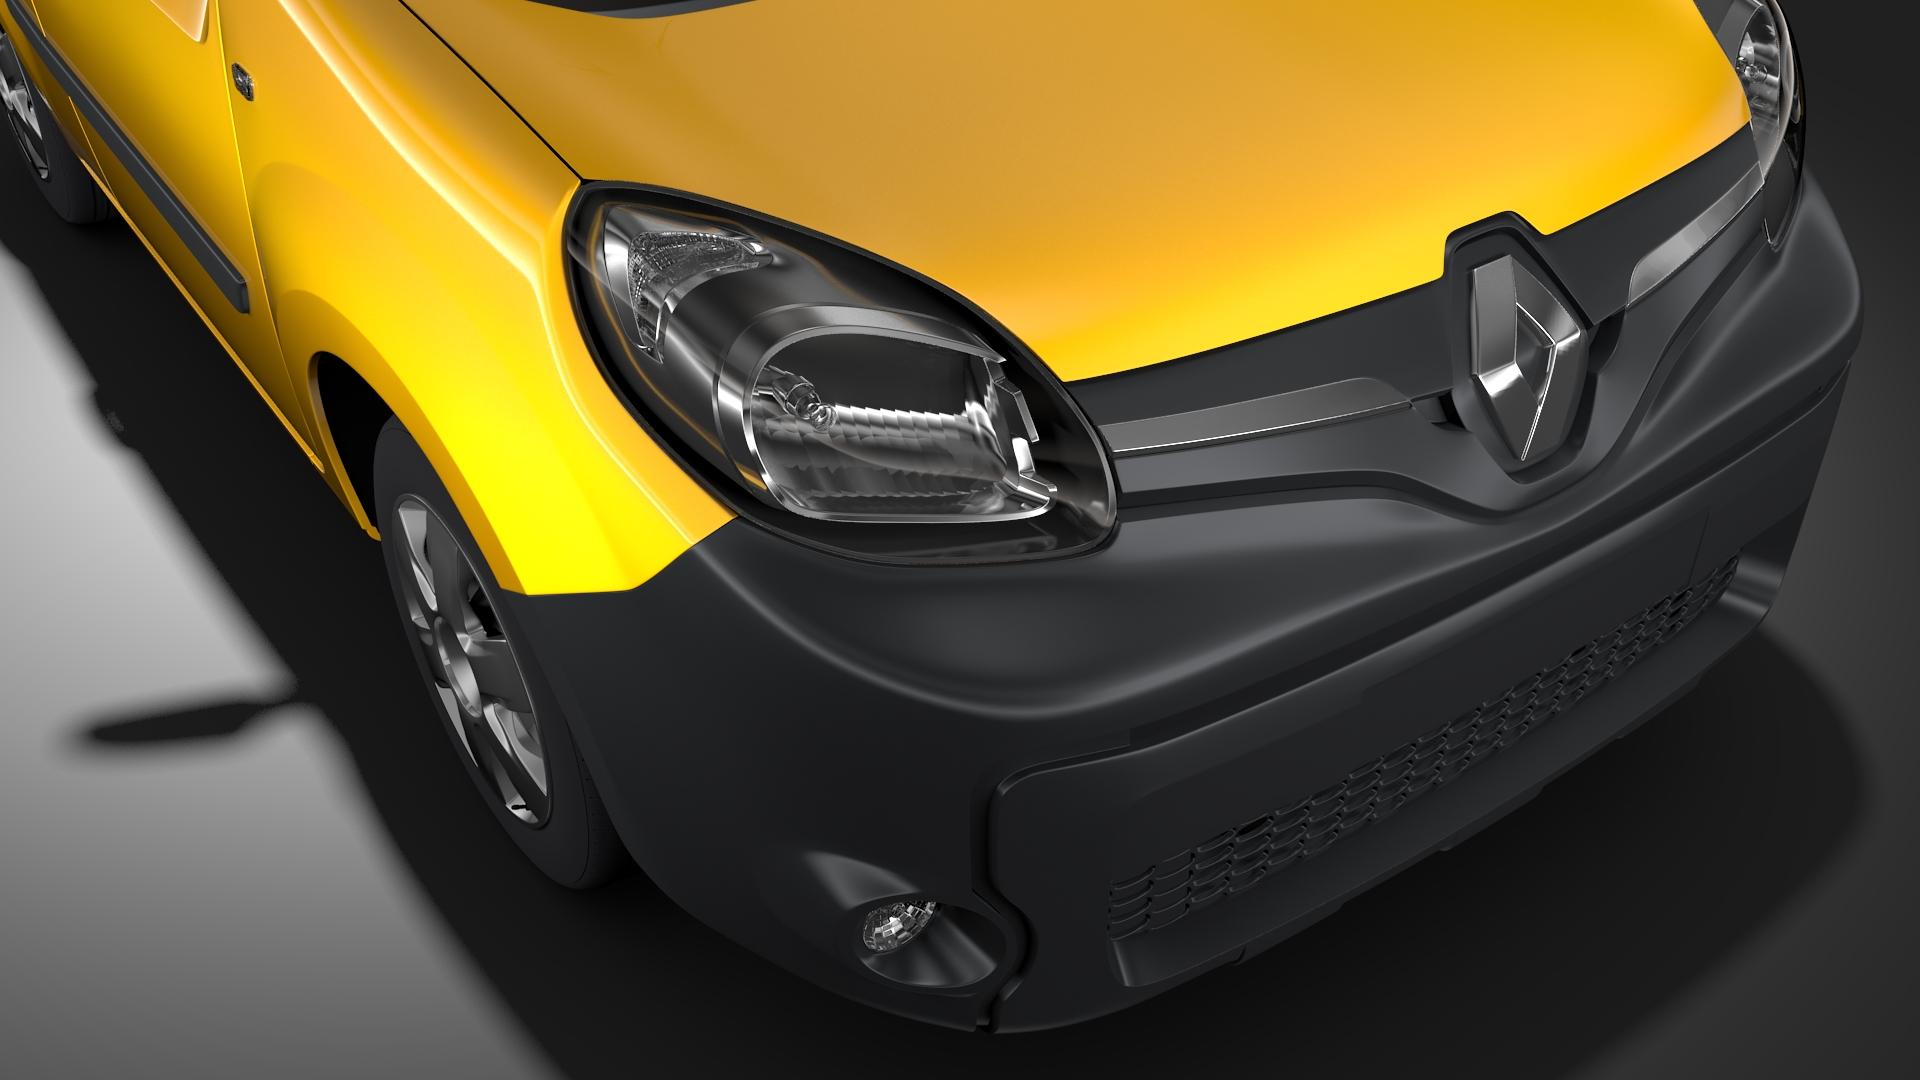 renault kangoo van 2017 l1 2017 3d model maks.